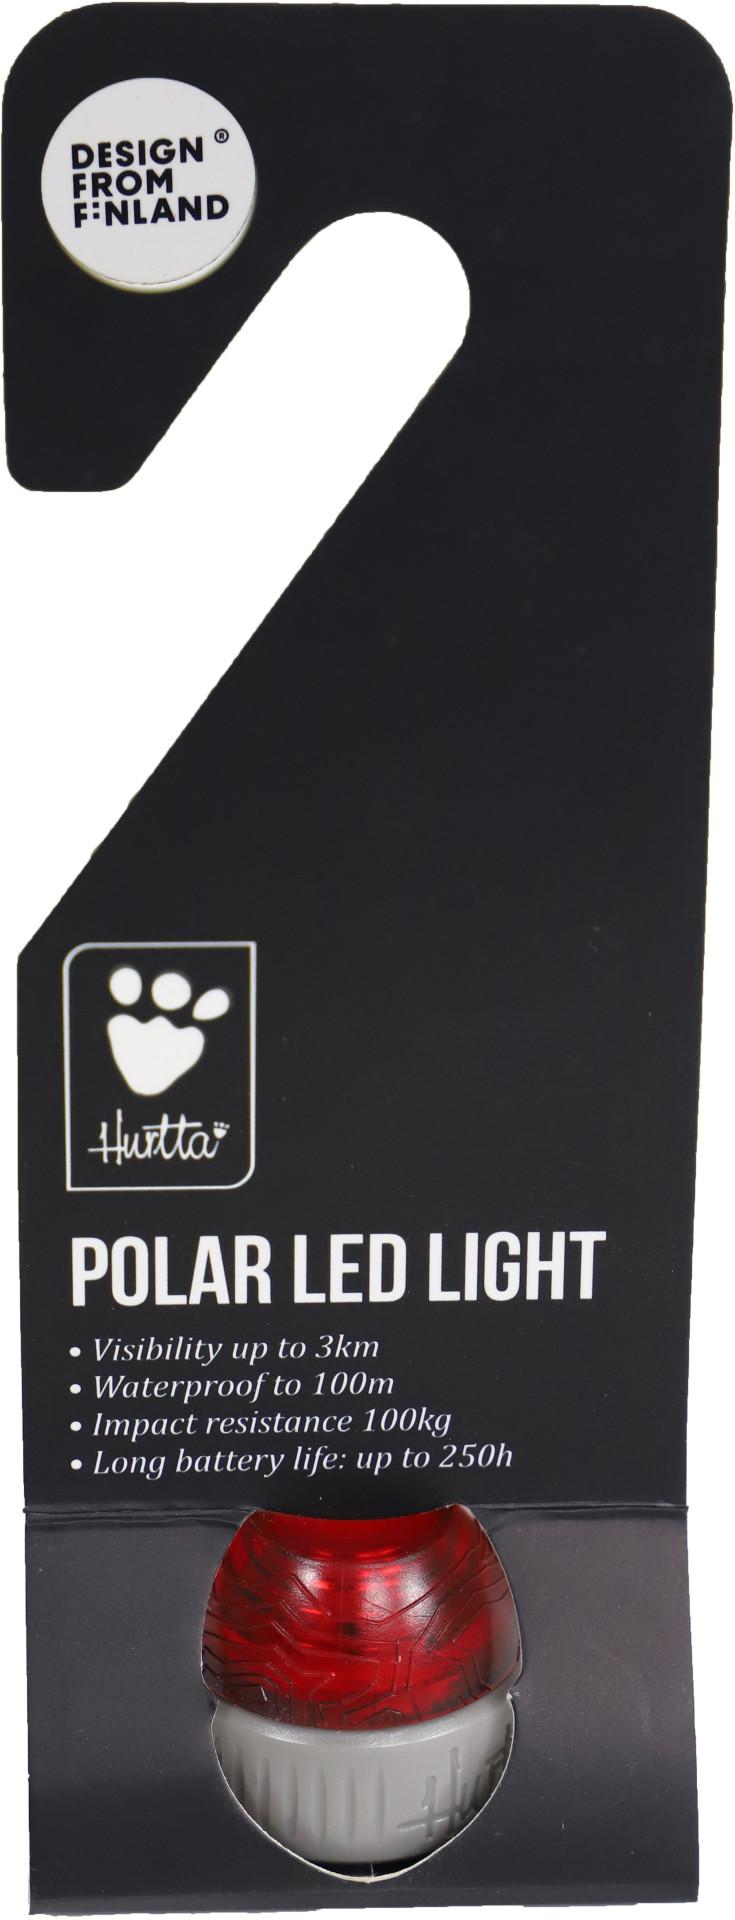 Hurtta Adventure Polar LED lamp red